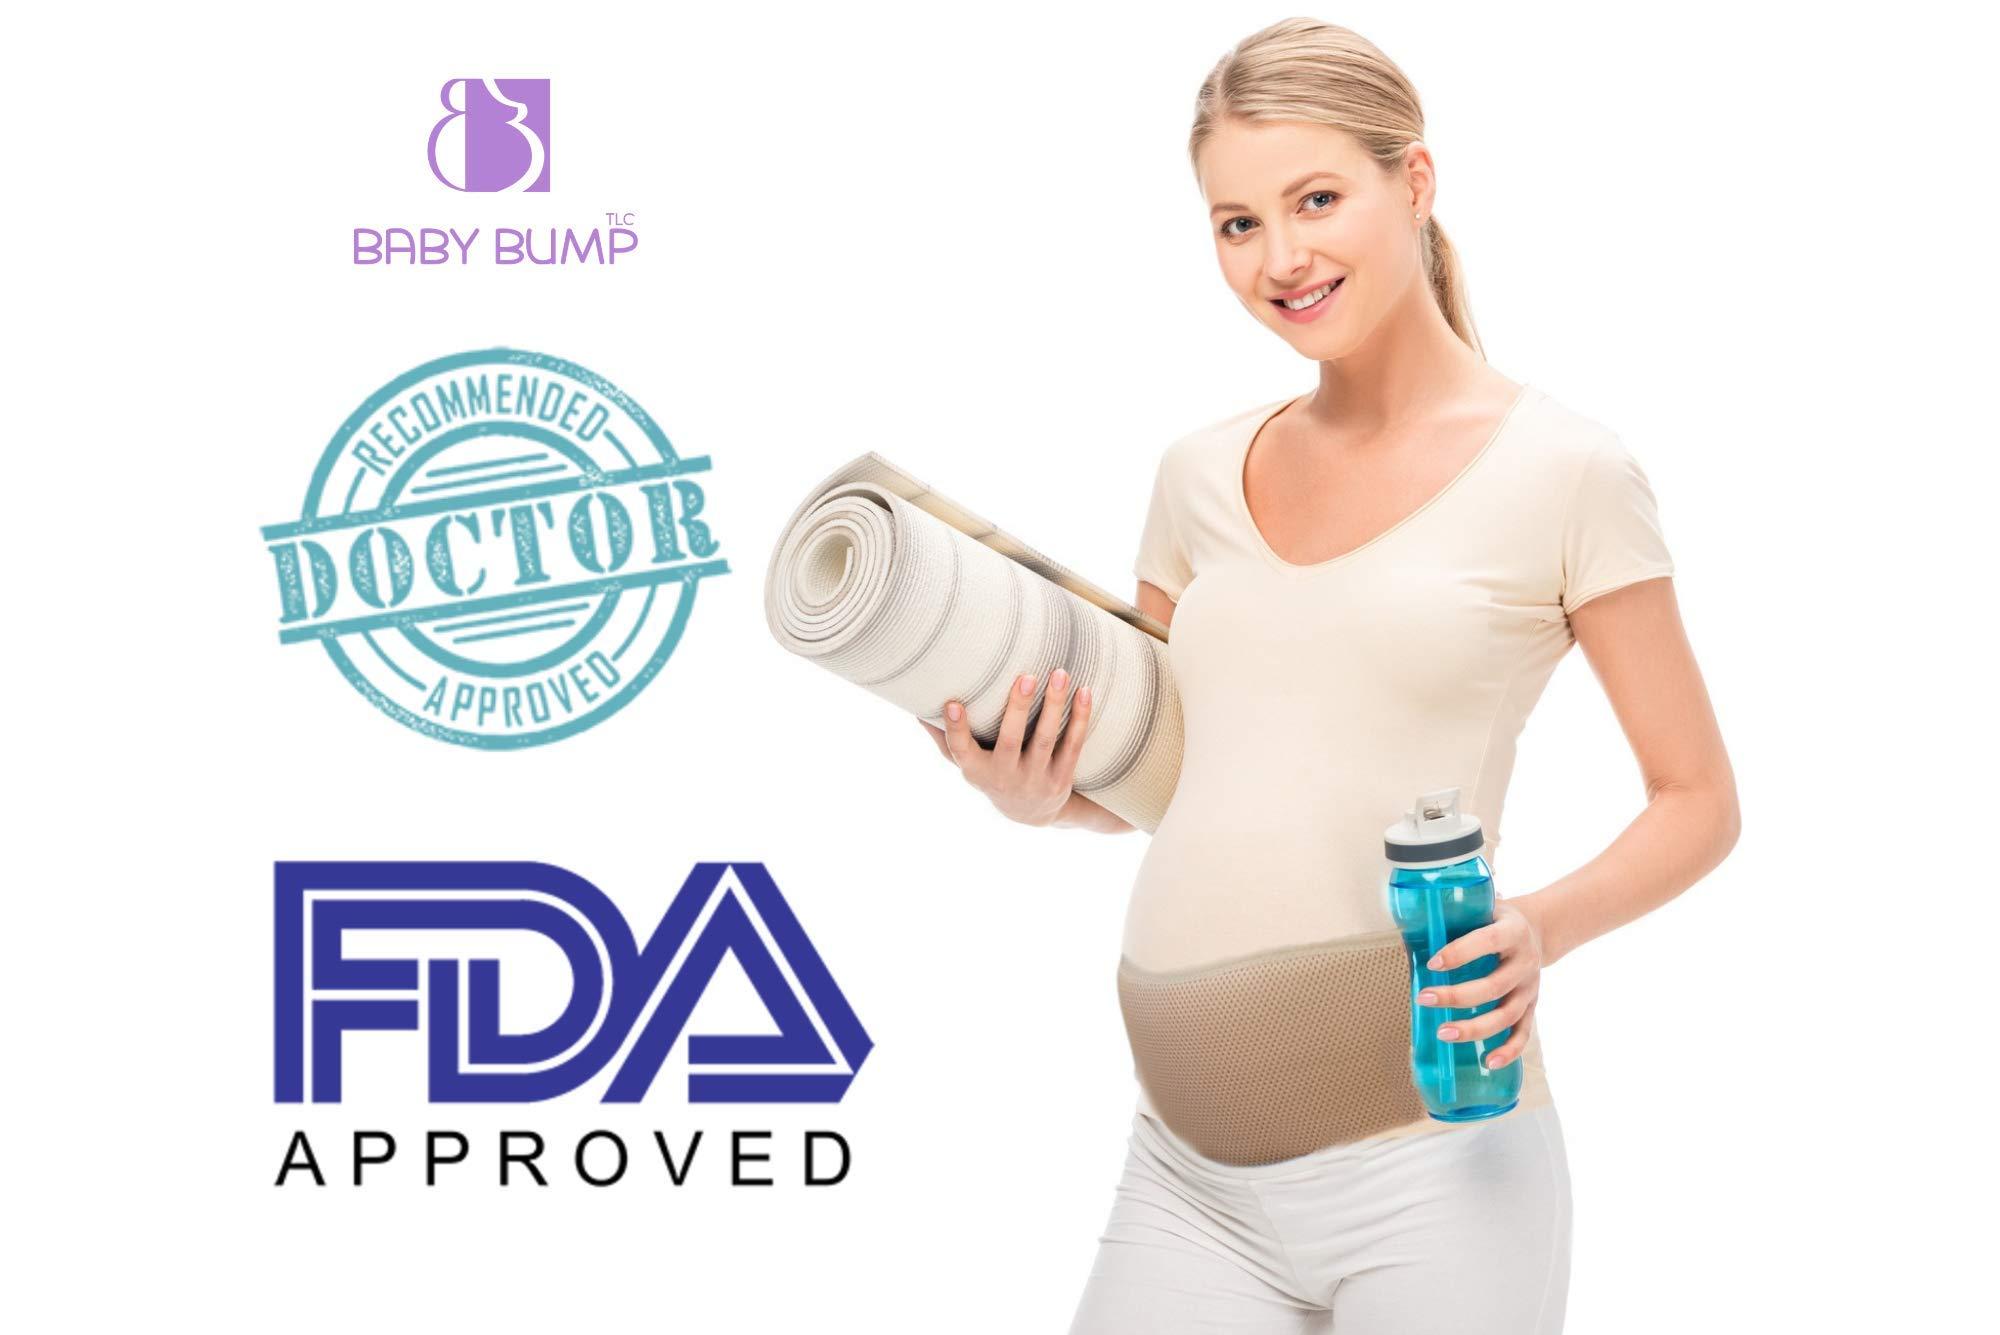 Baby Bump TLC Maternity Belt Abdominal Belly Band